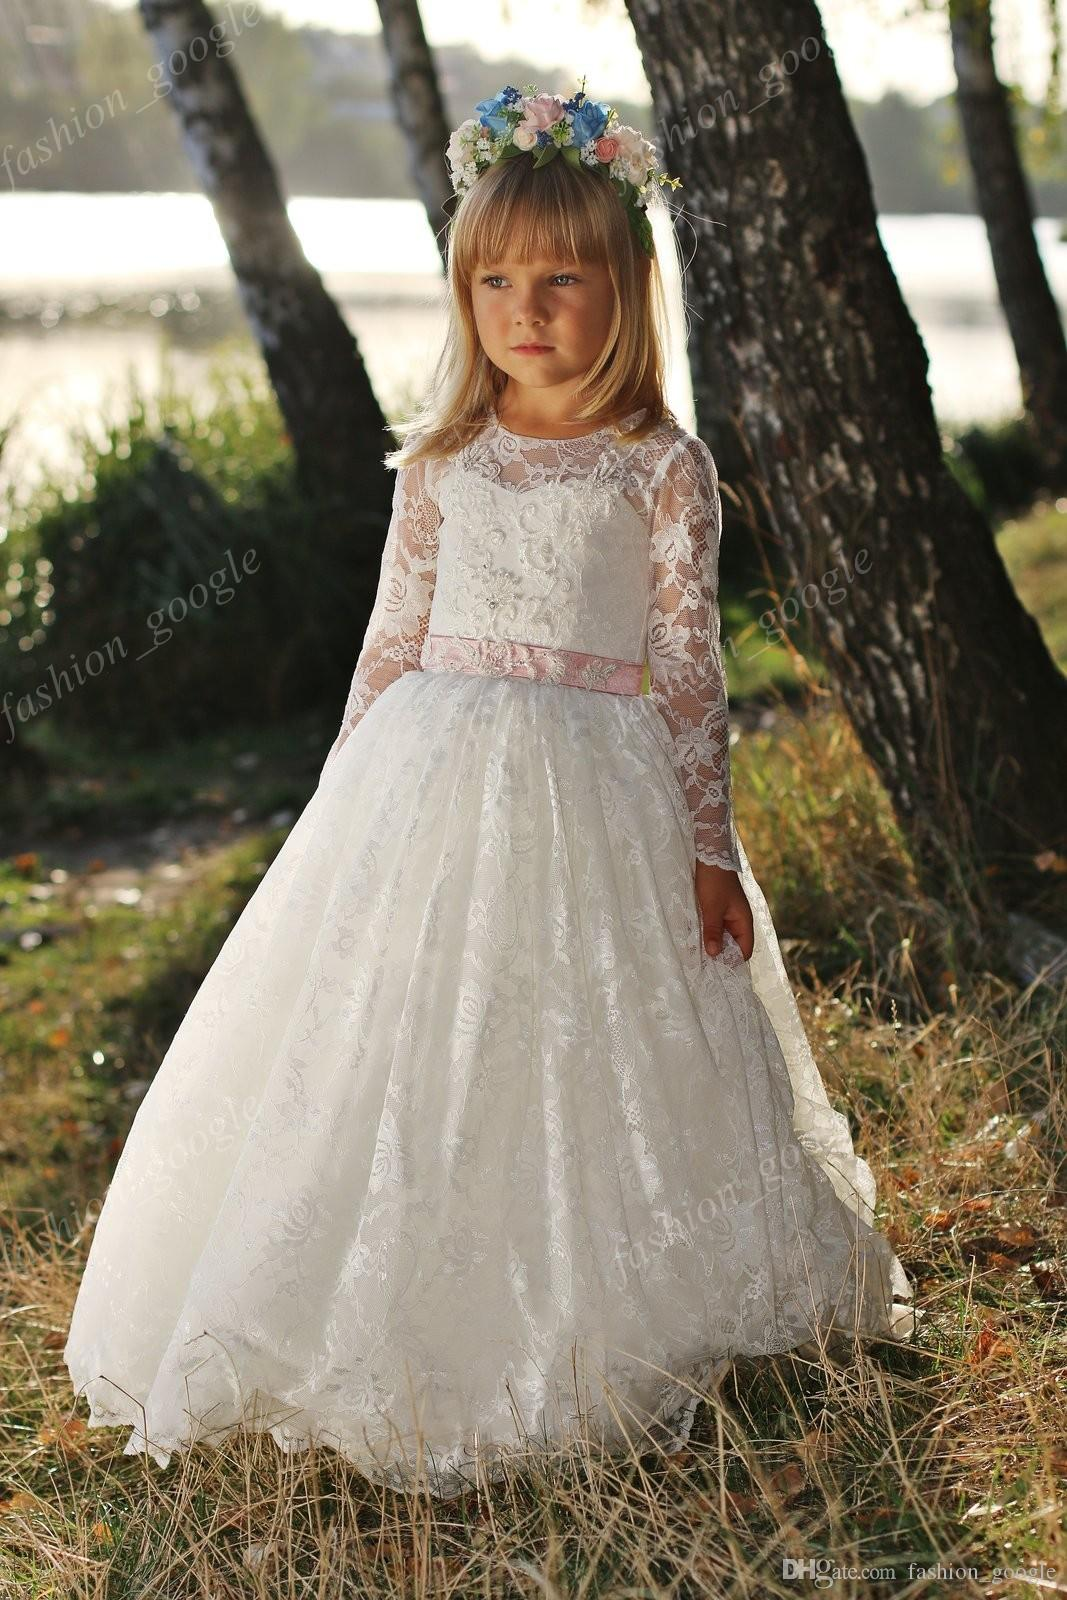 Fully Lace 1st Communion Dresses for Little Girls 2018 with Long Sleeves & Pink Sash Elegant Mother Daughter Wedding Dress for Flower Girls